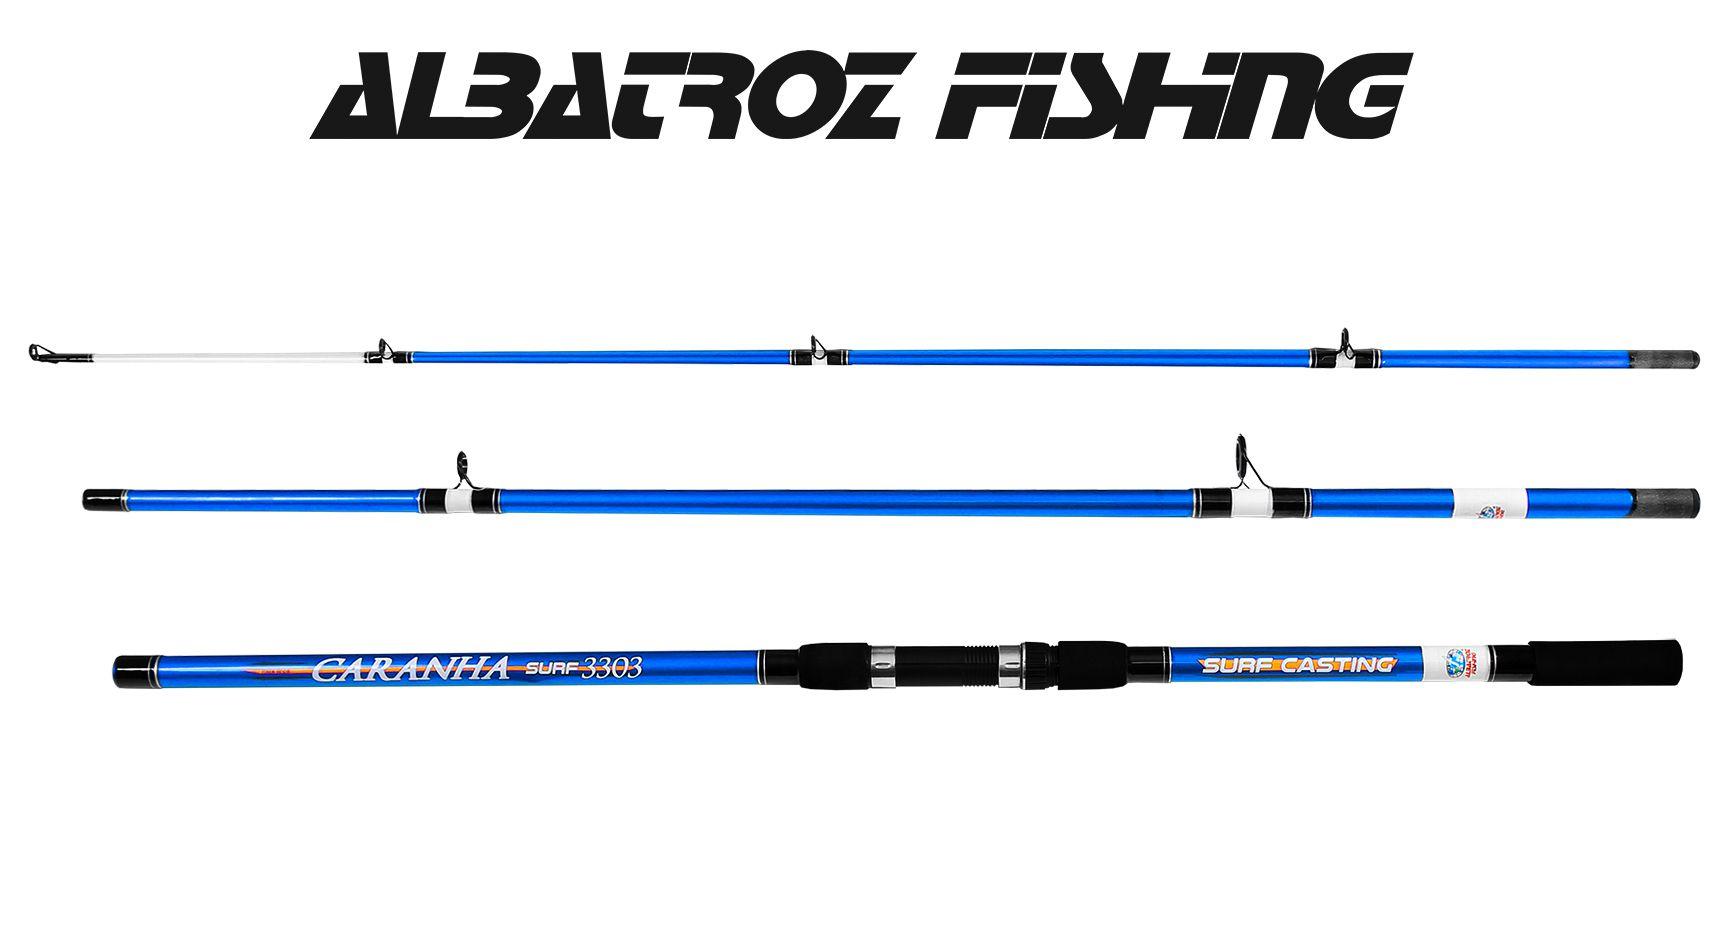 Vara Para Molinete Albatroz Fishing Caranha Surf 3903 (3,90m) 40-60Lb - 3 Partes